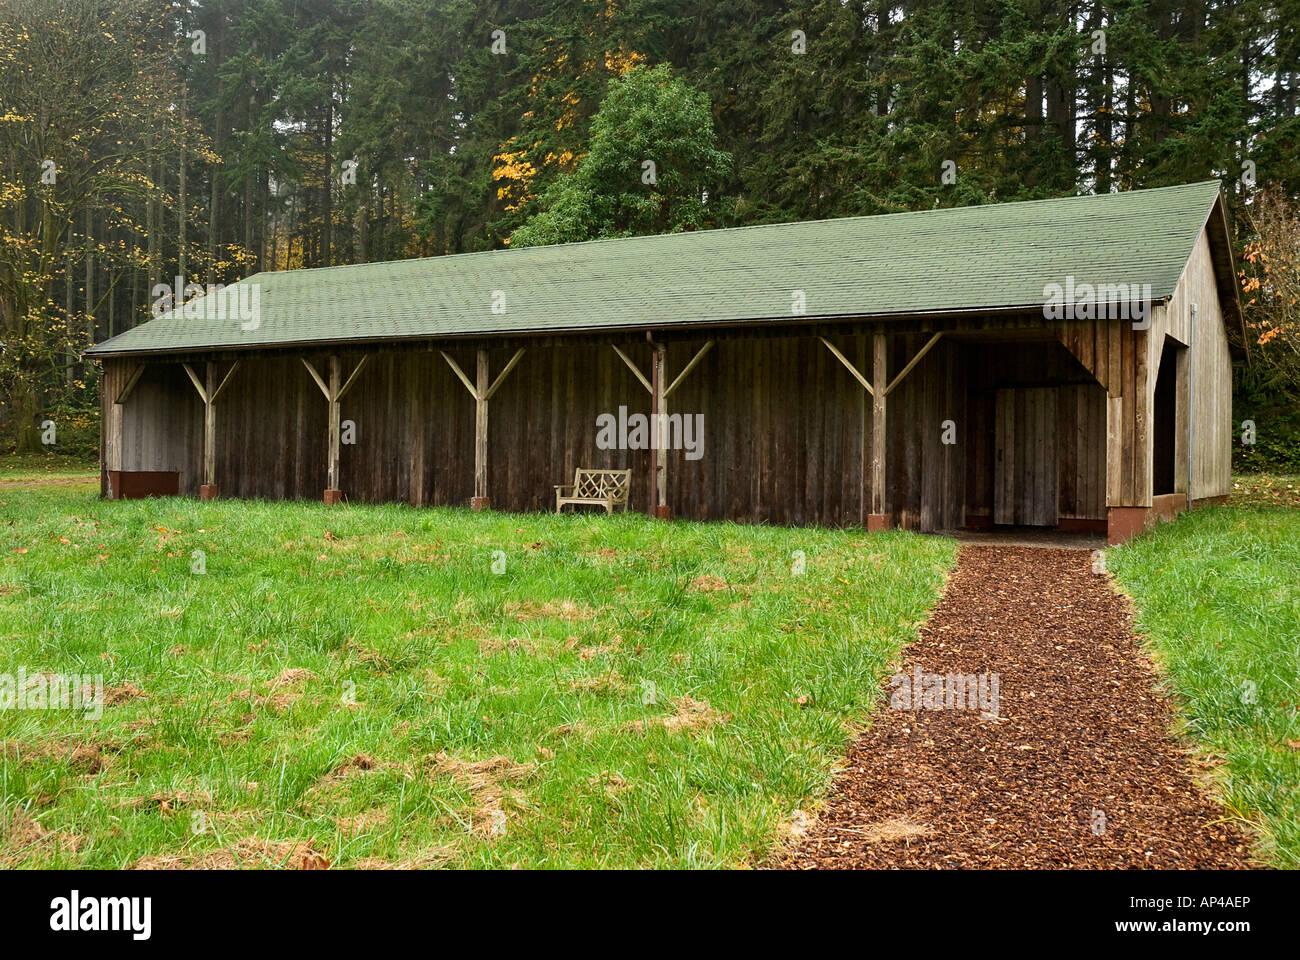 Storage Barn At Bloedel Reserve Bainbridge Island Washington   Stock Image